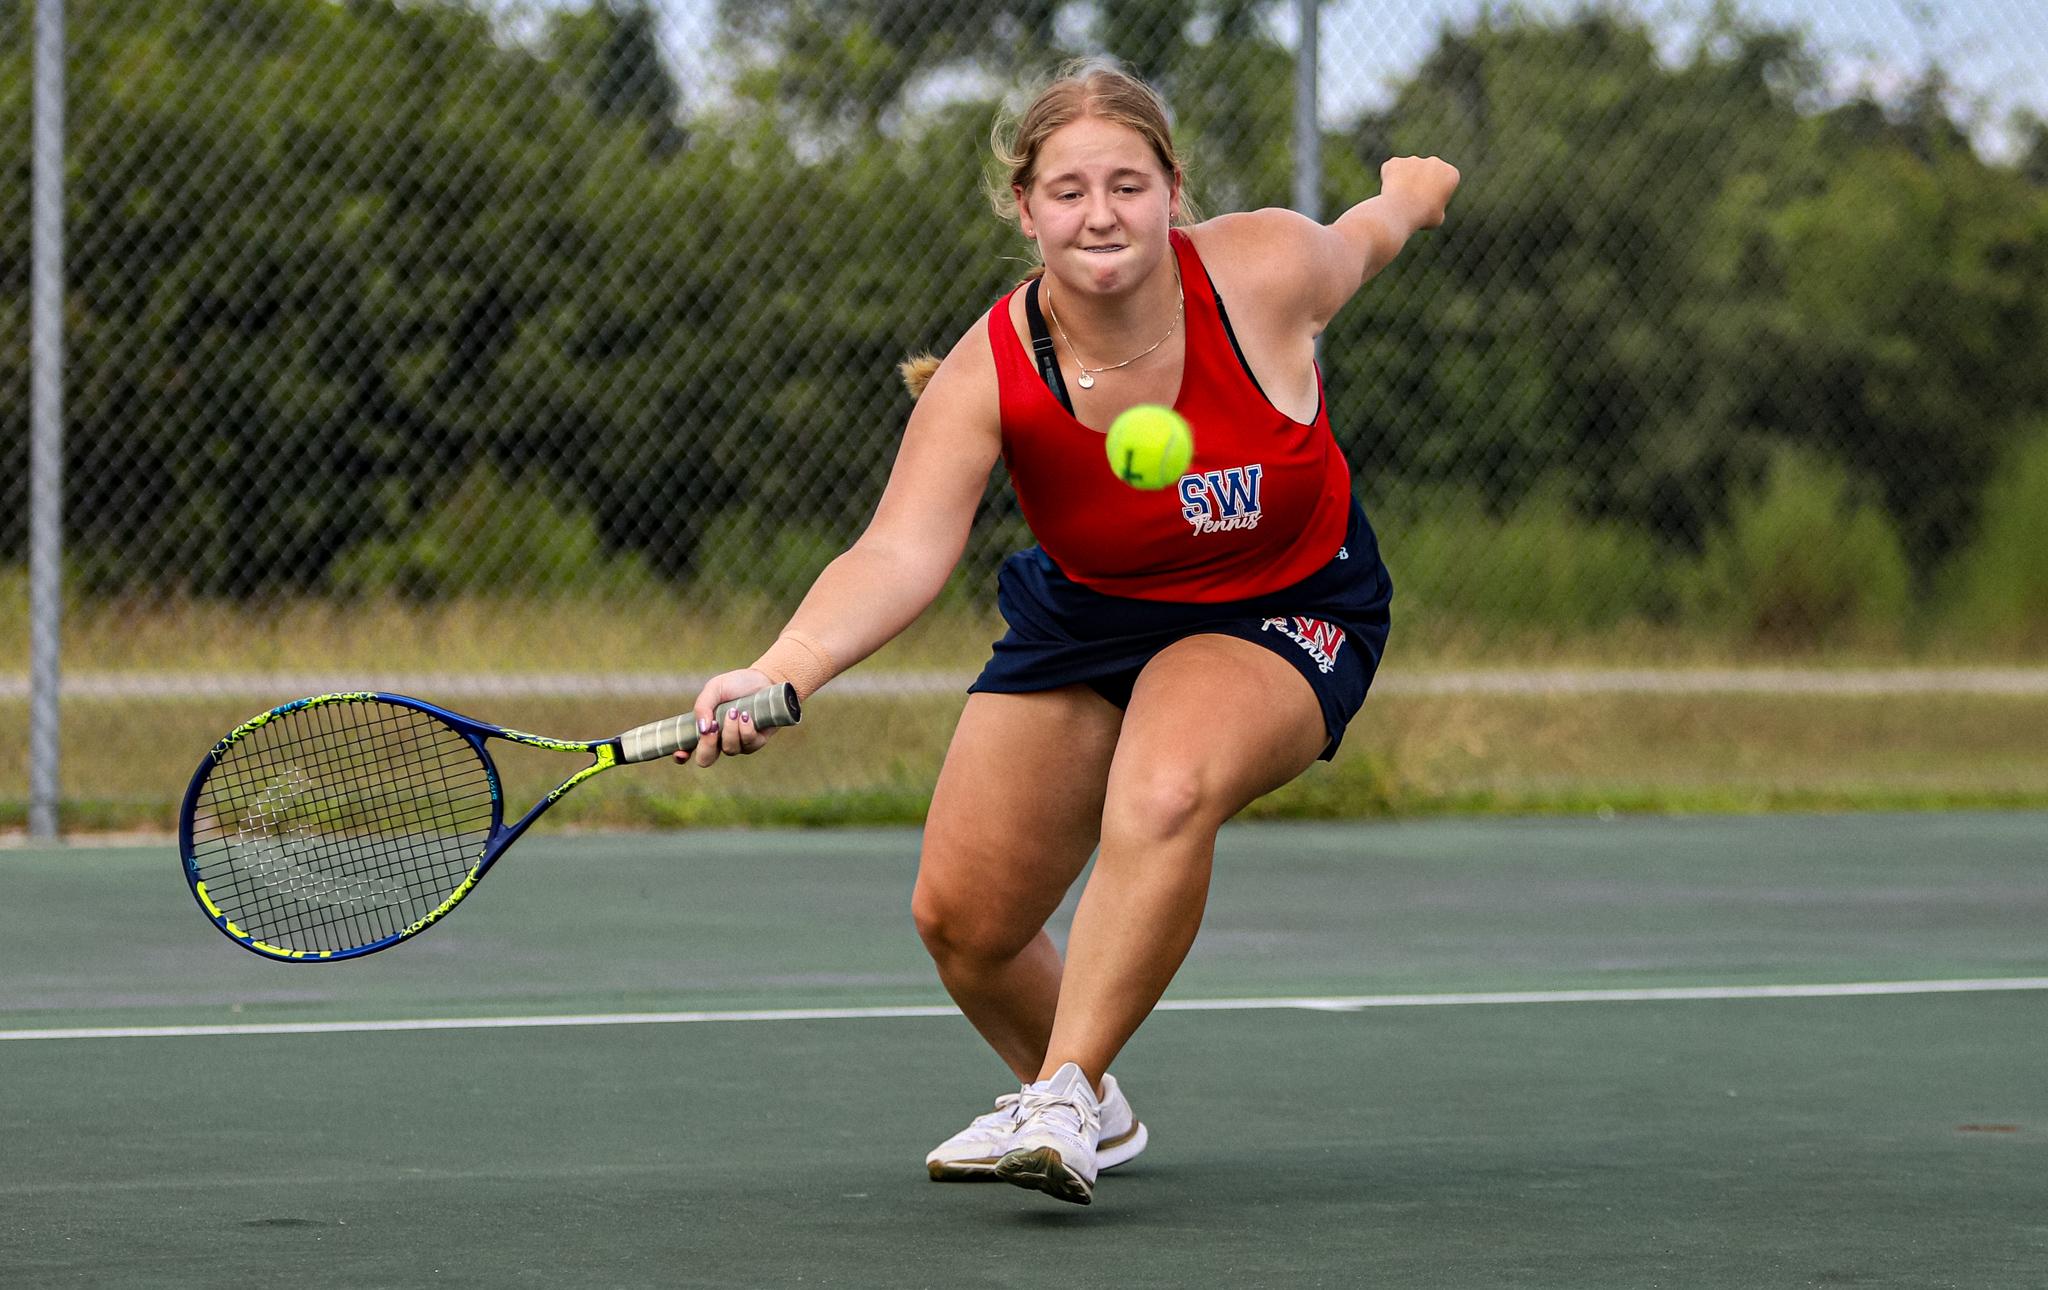 Girls Tennis: Southern Wayne Goes Up Against Smithfield-Selma (PHOTO GALLERY)